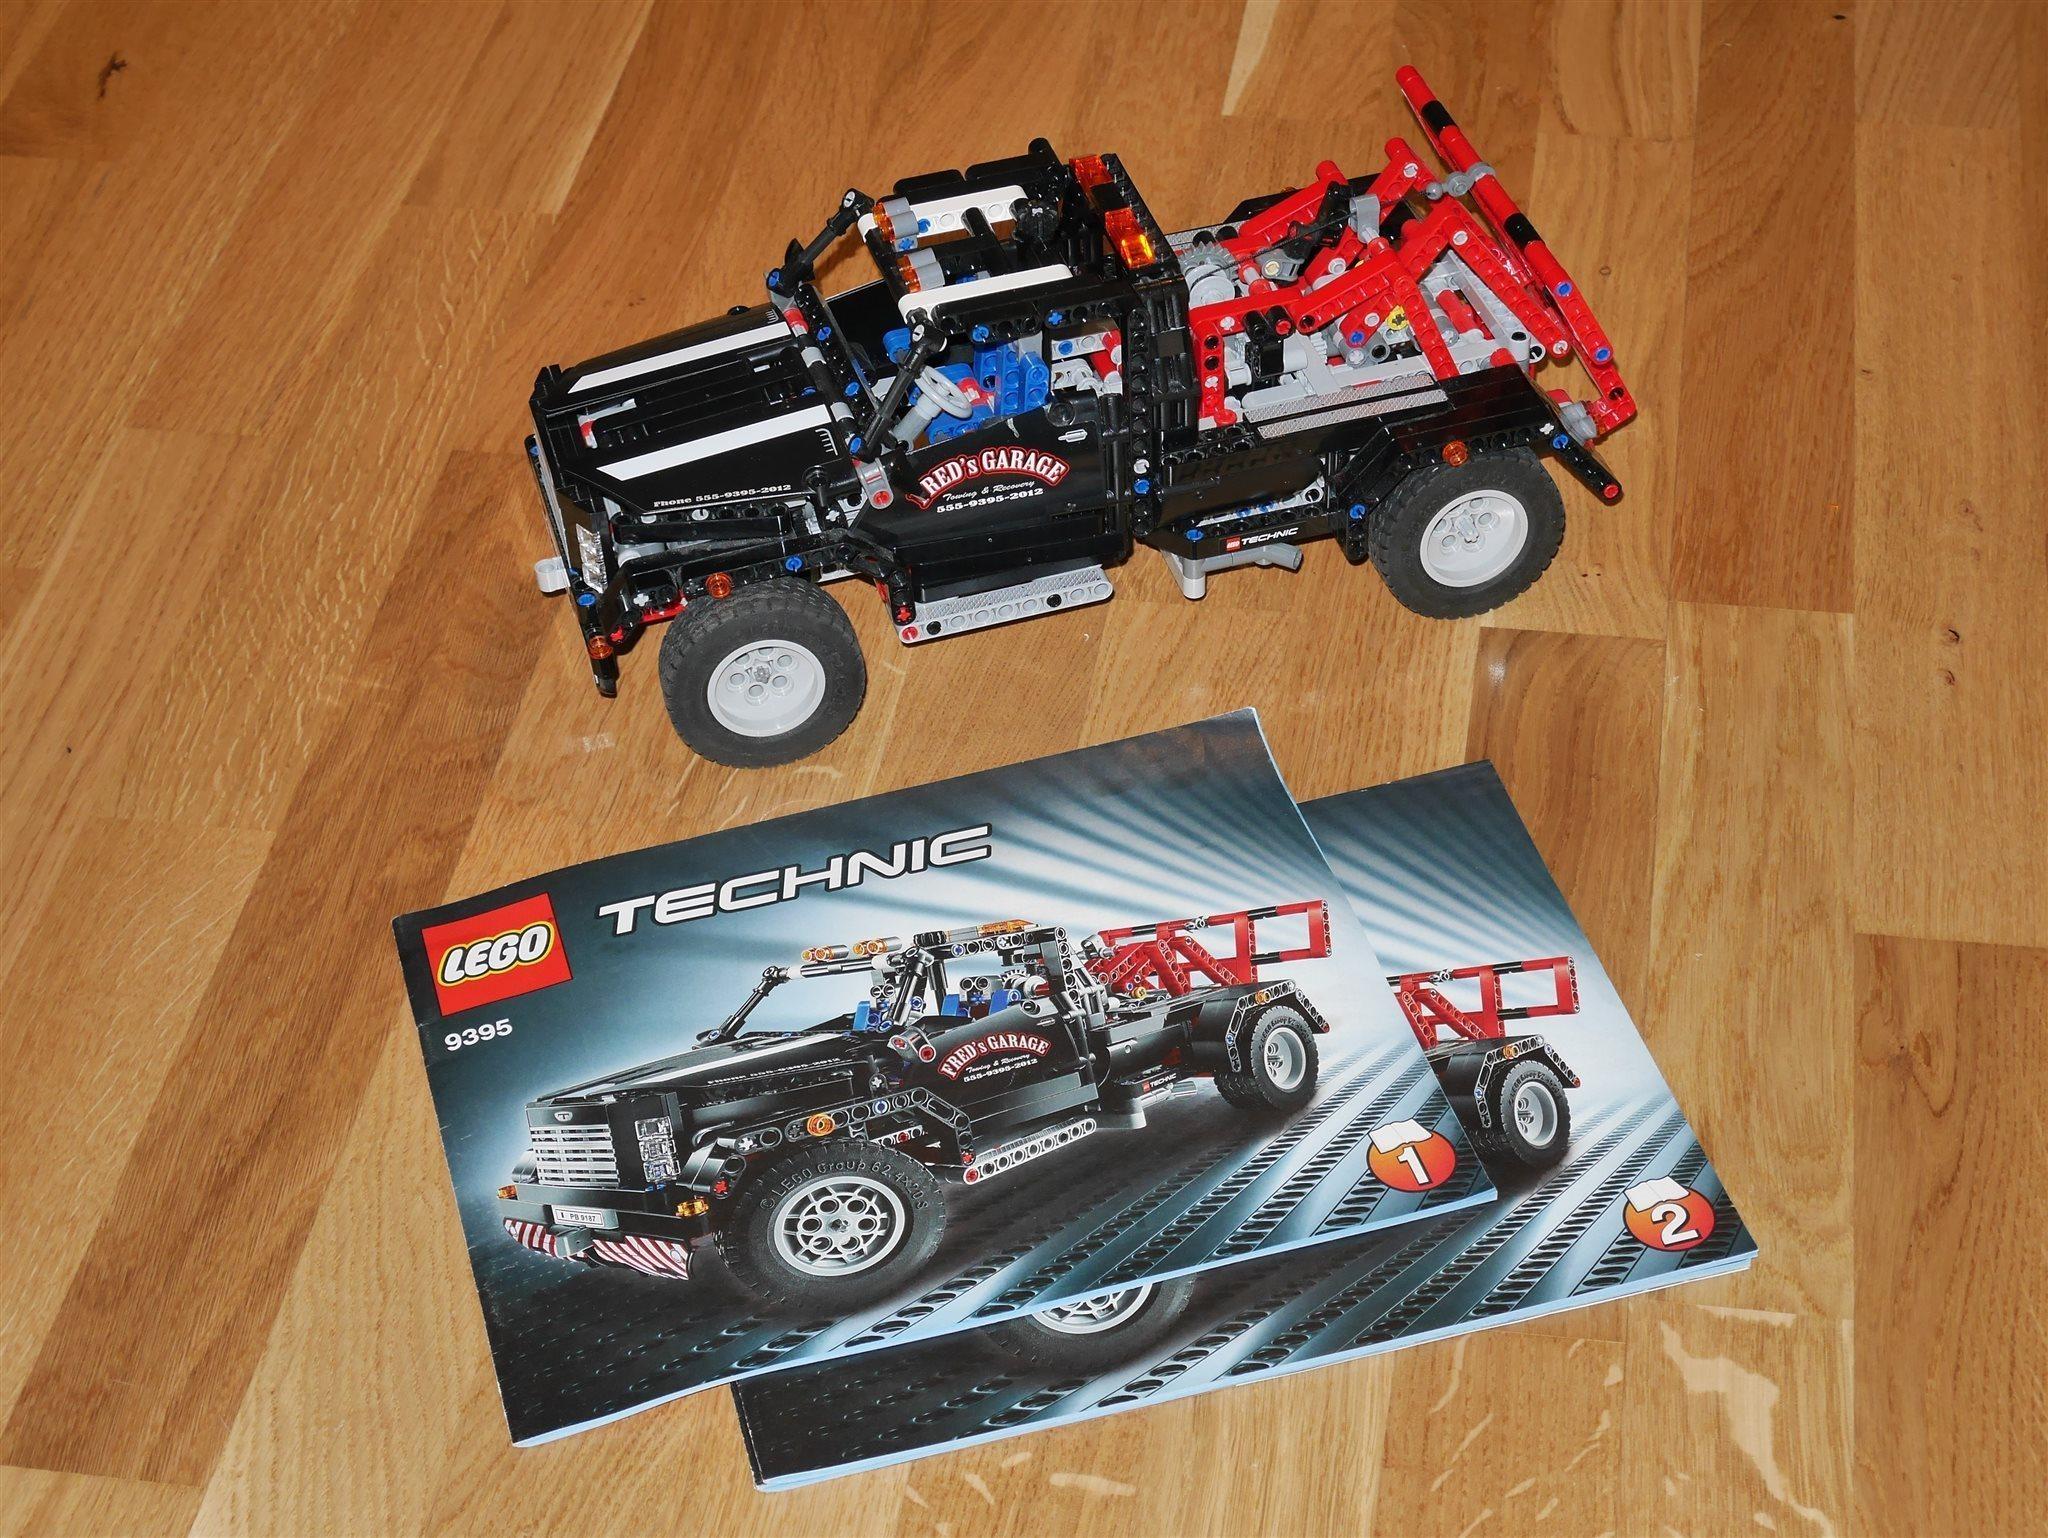 LEGO Technic 9395 Garagebärgare